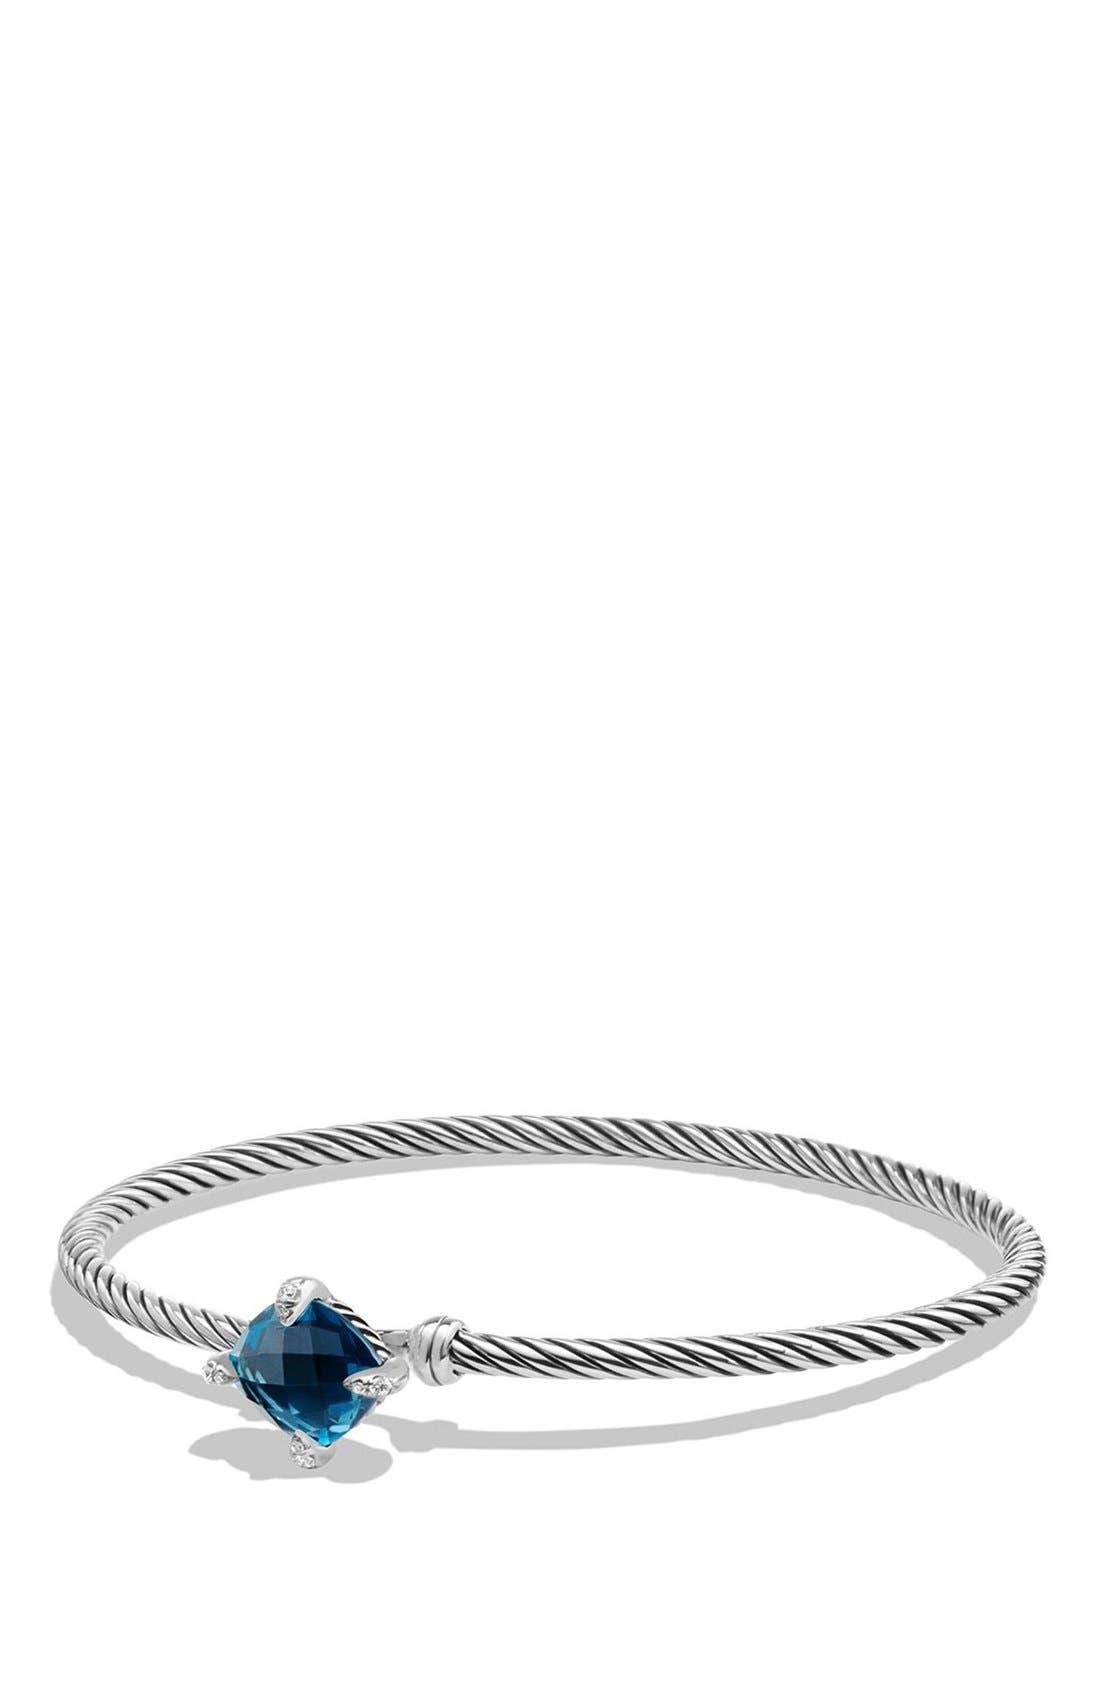 'Châtelaine' Bracelet with Diamonds,                         Main,                         color, SILVER/ HAMPTON BLUE TOPAZ